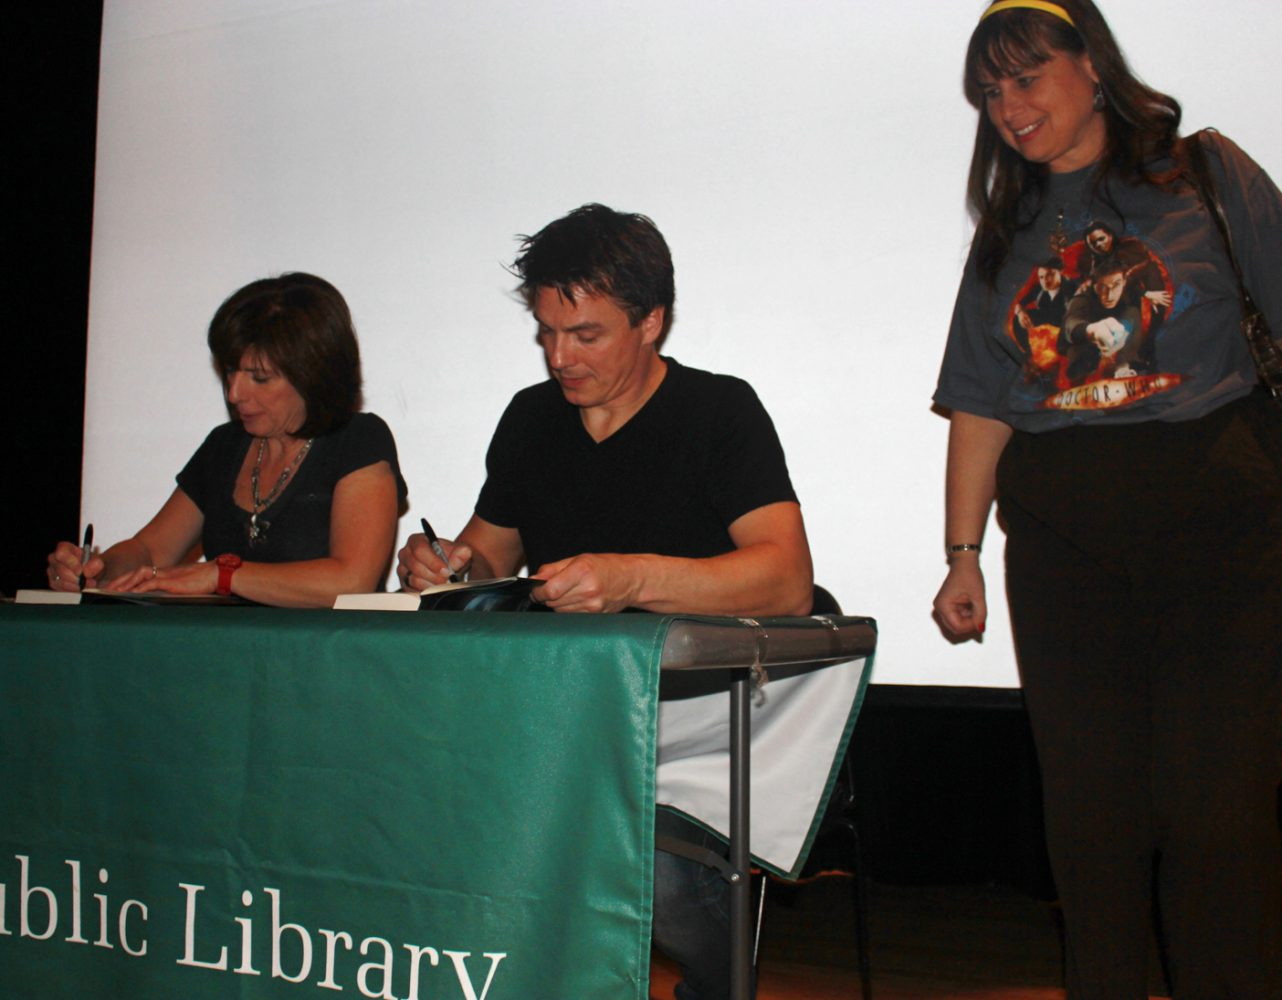 Skokie+Public+Library+Hosts+John+Barrowman+Book+Tour